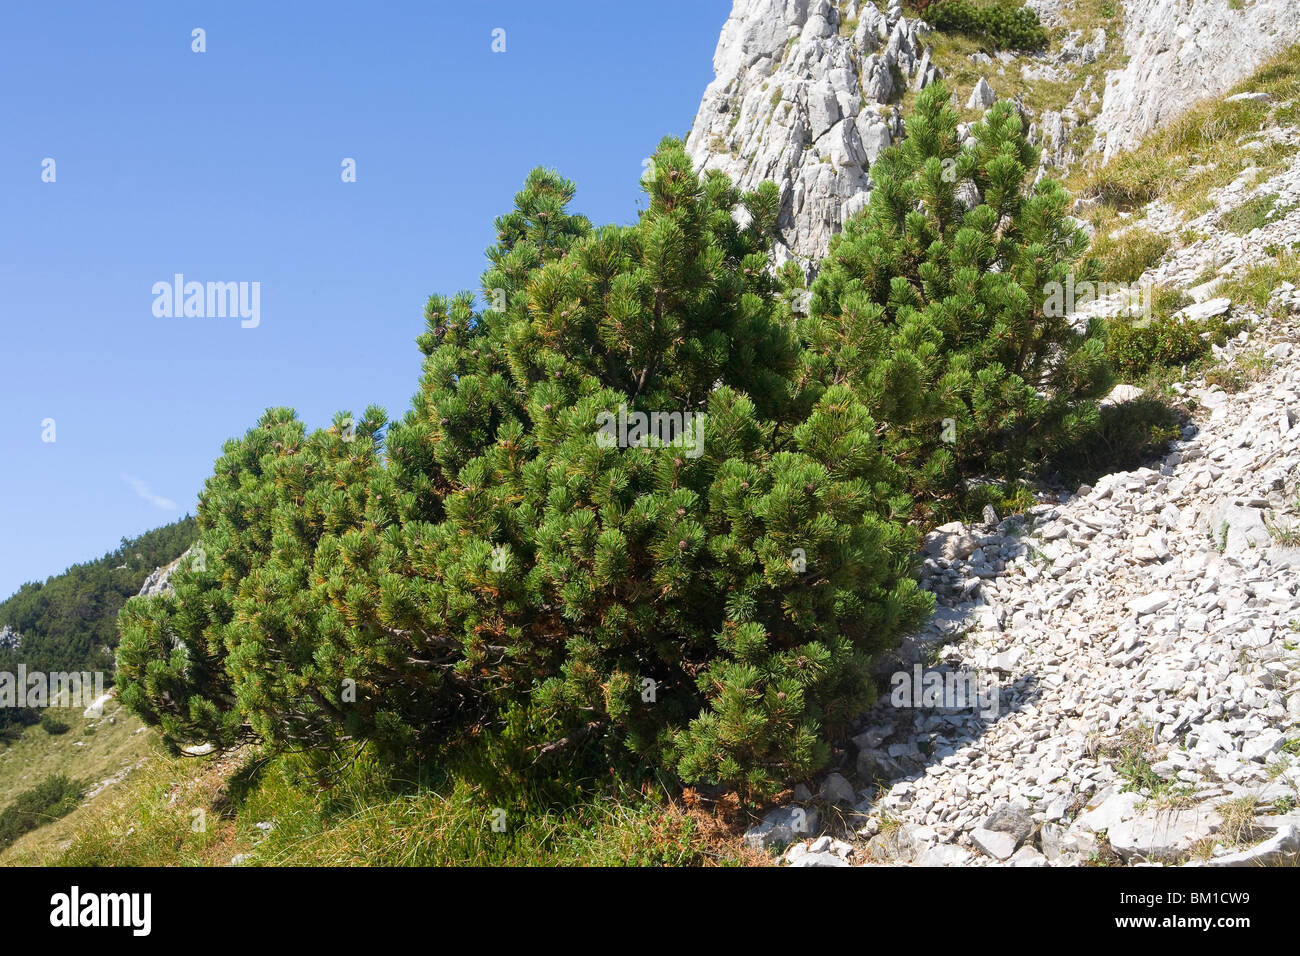 Pinus Mughus, Dwarf Mountain Pine, Pino Mugo   Stock Image